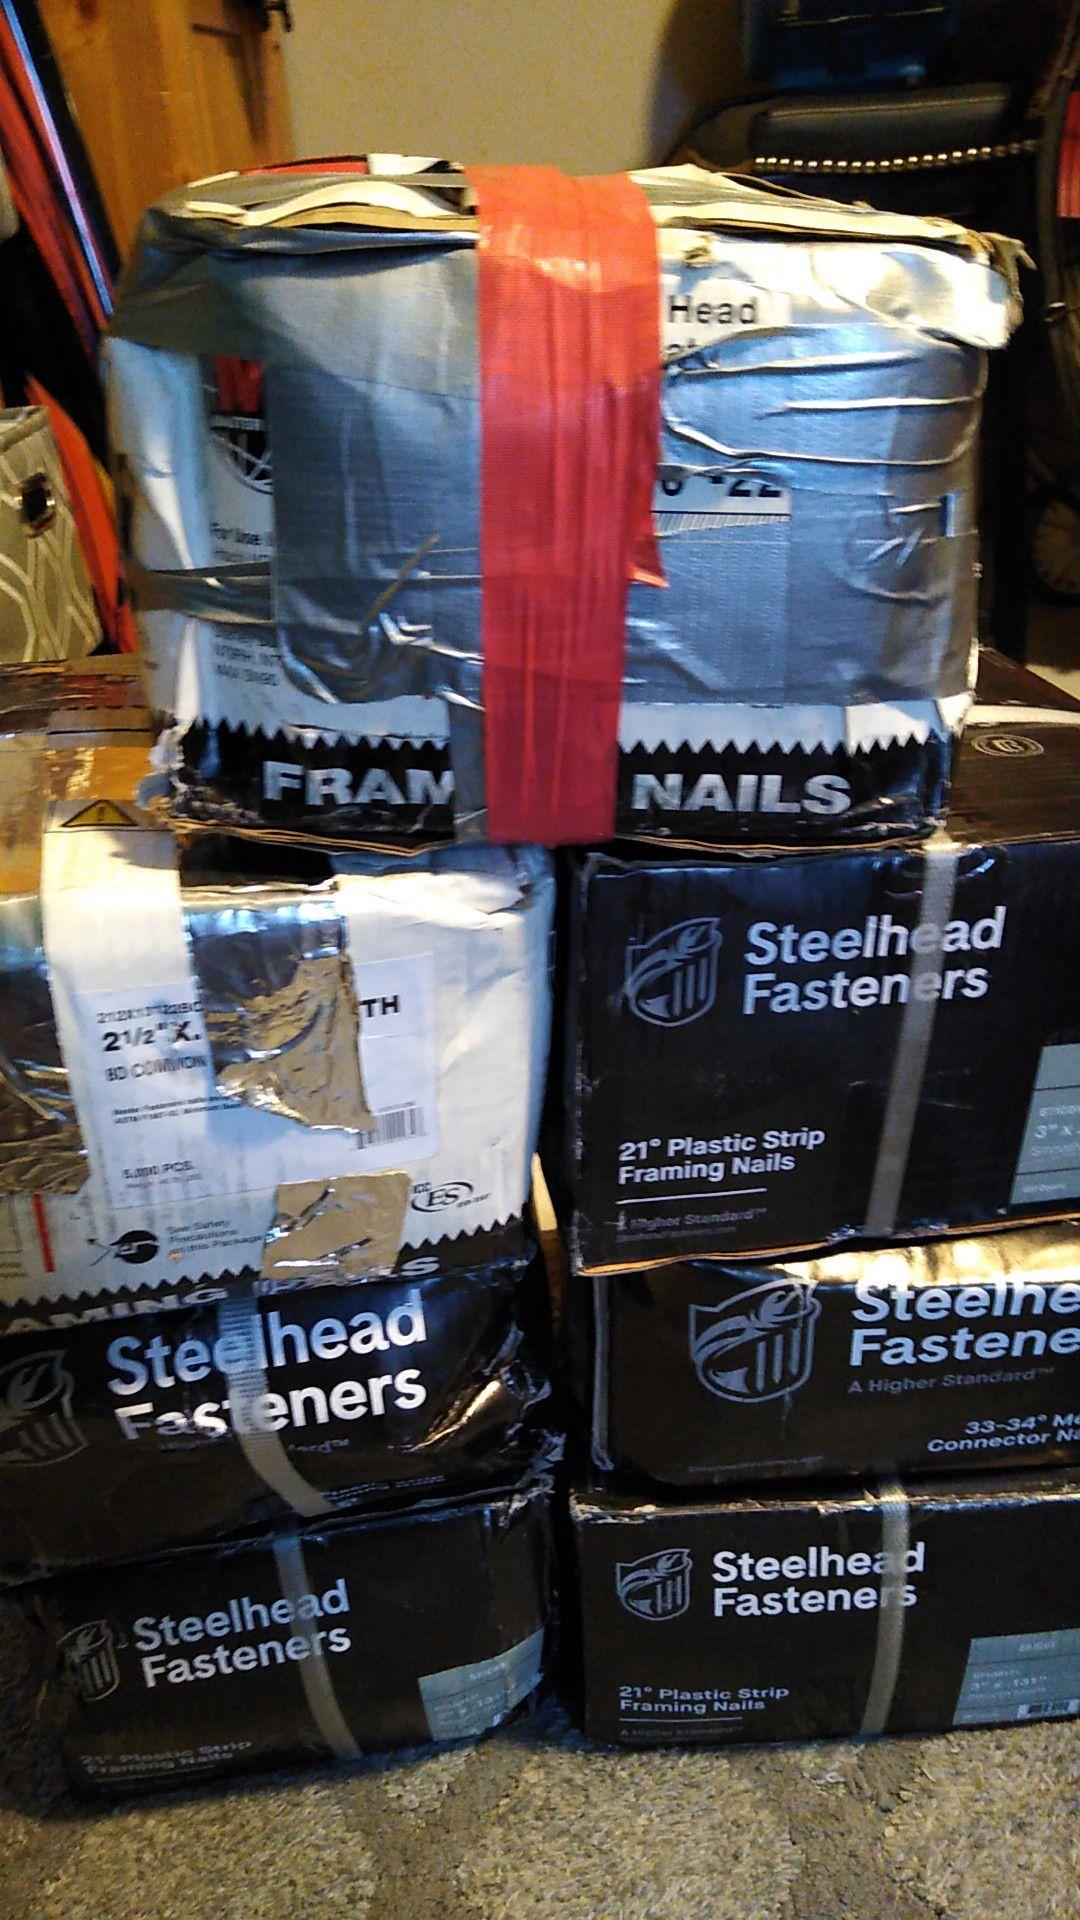 Steelhead fasteners framing nails